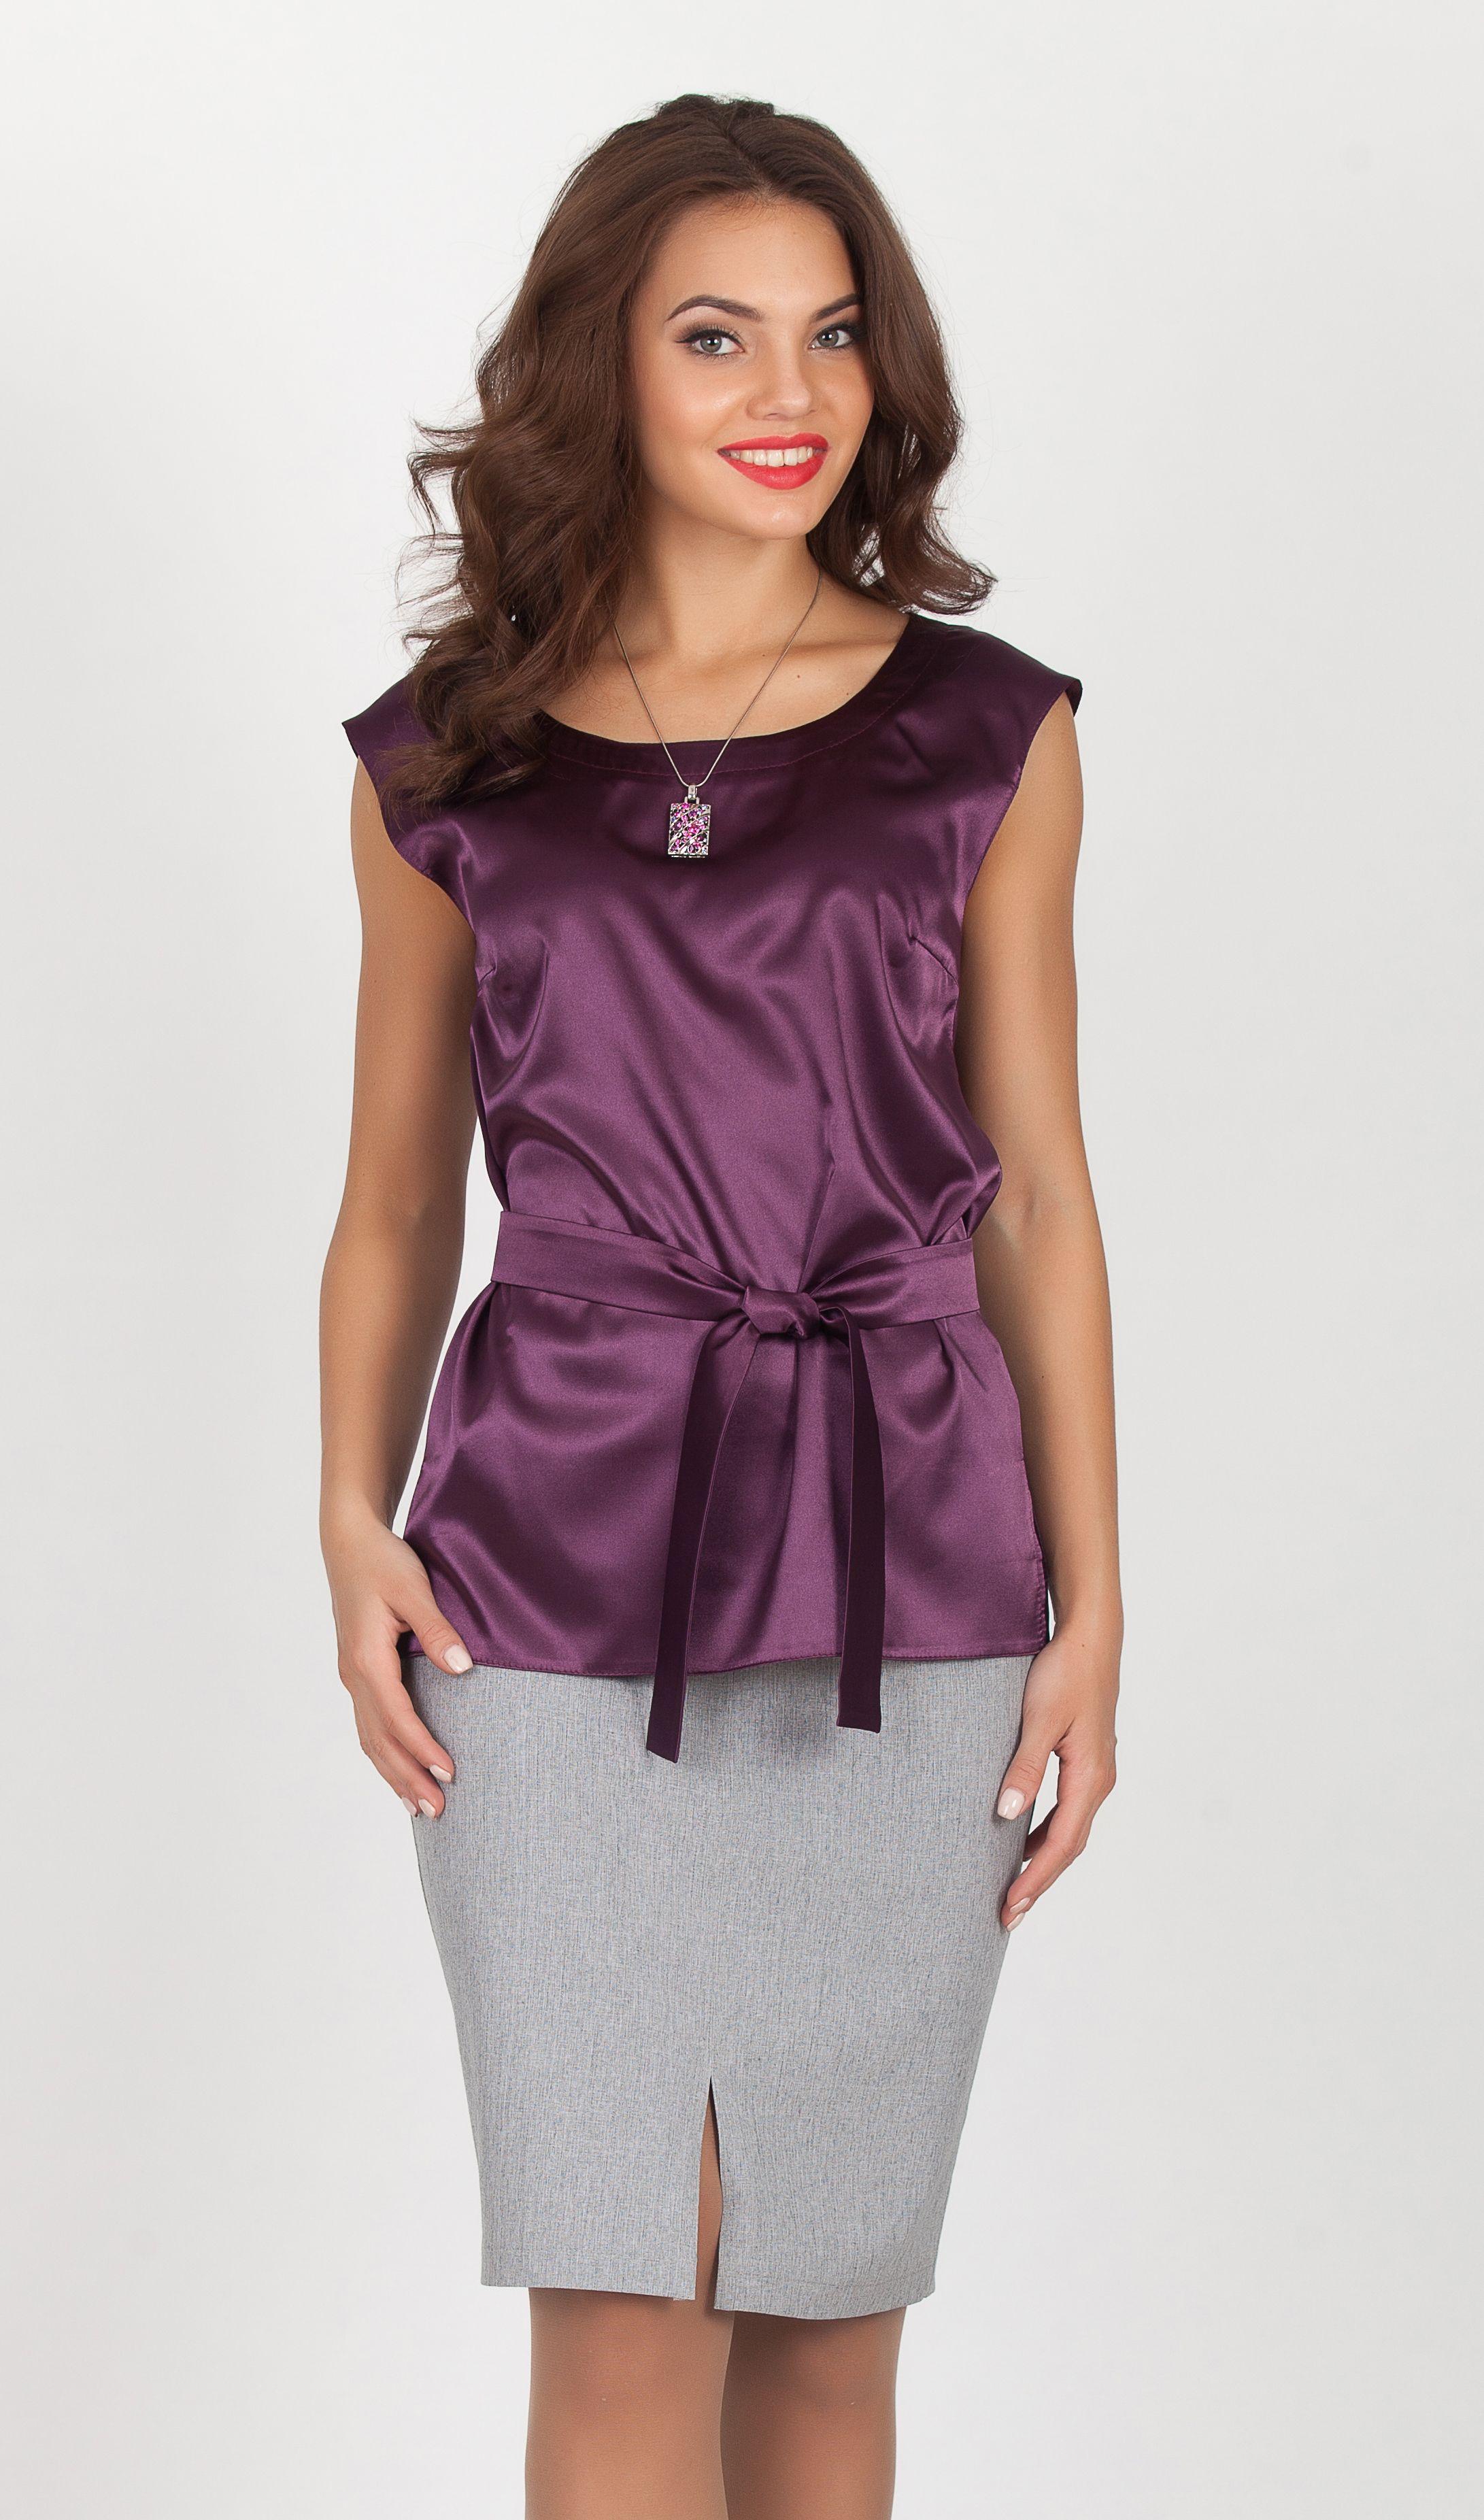 Purple Sleeveless Satin Blouse | Blouses/Tops | Pinterest | Blusas y ...